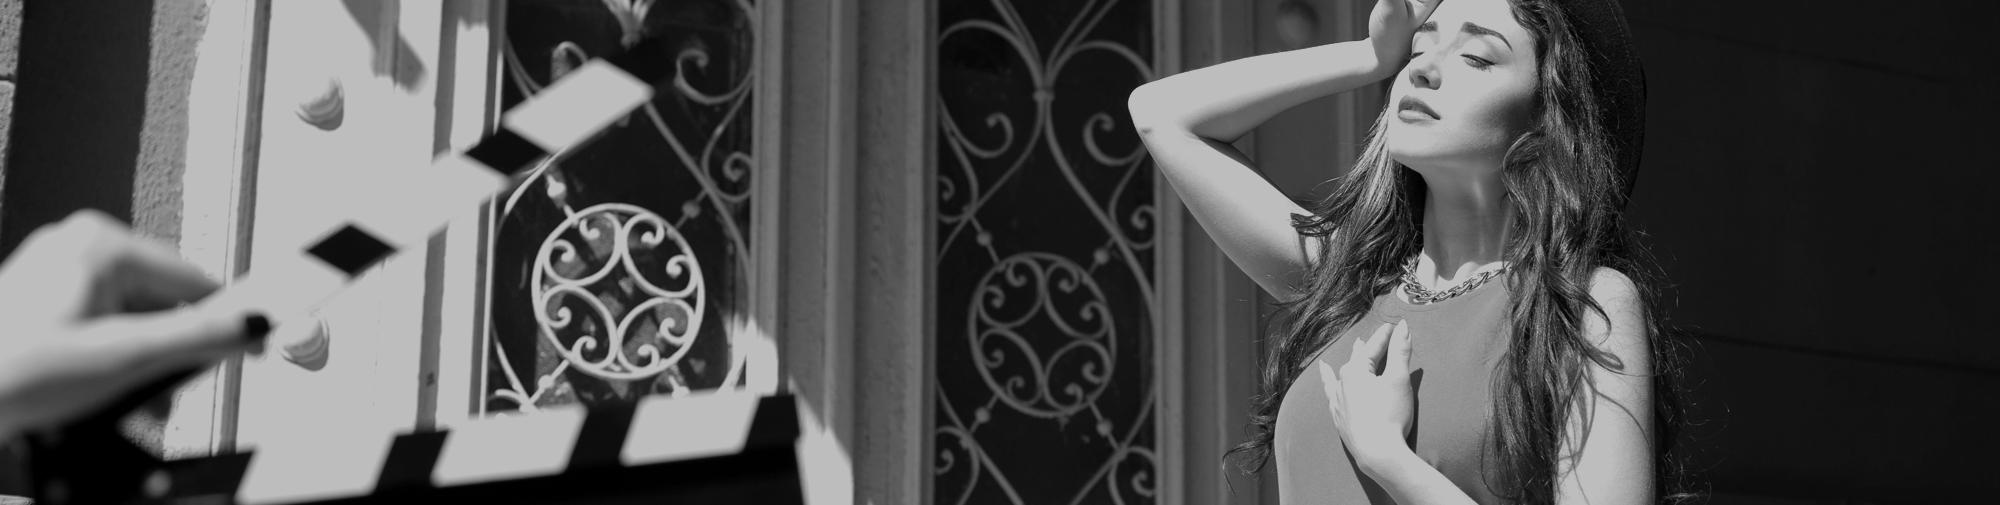 jeune fille qui joue une scene au chateau troissy internat college lycee cinema 7e art film